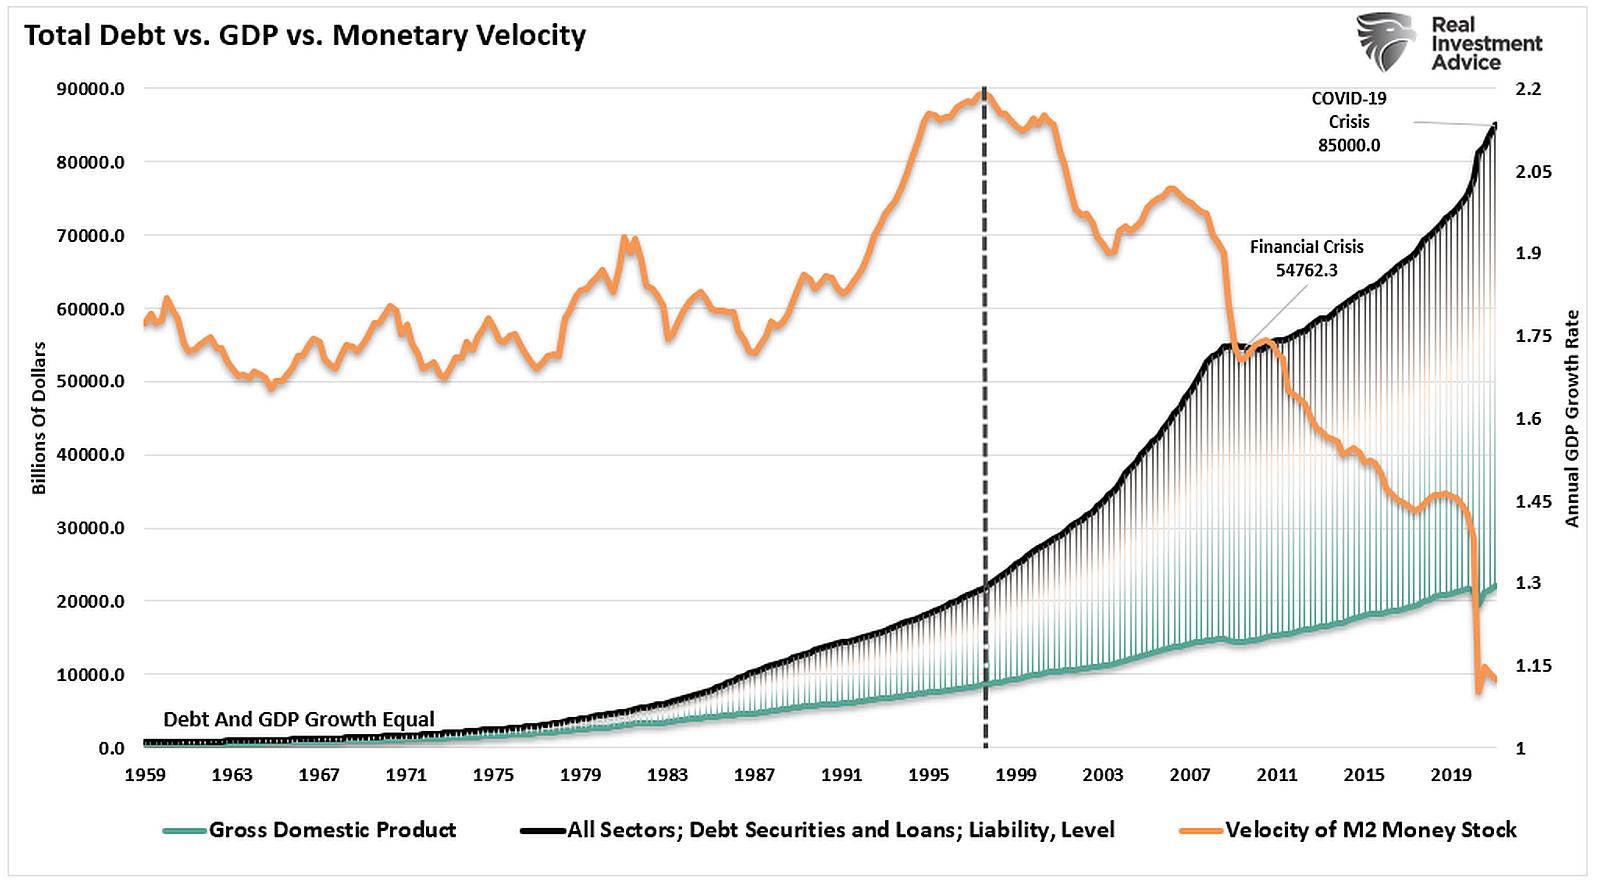 Total-Debt-vs-GDP-vs-Monetary-Velocity